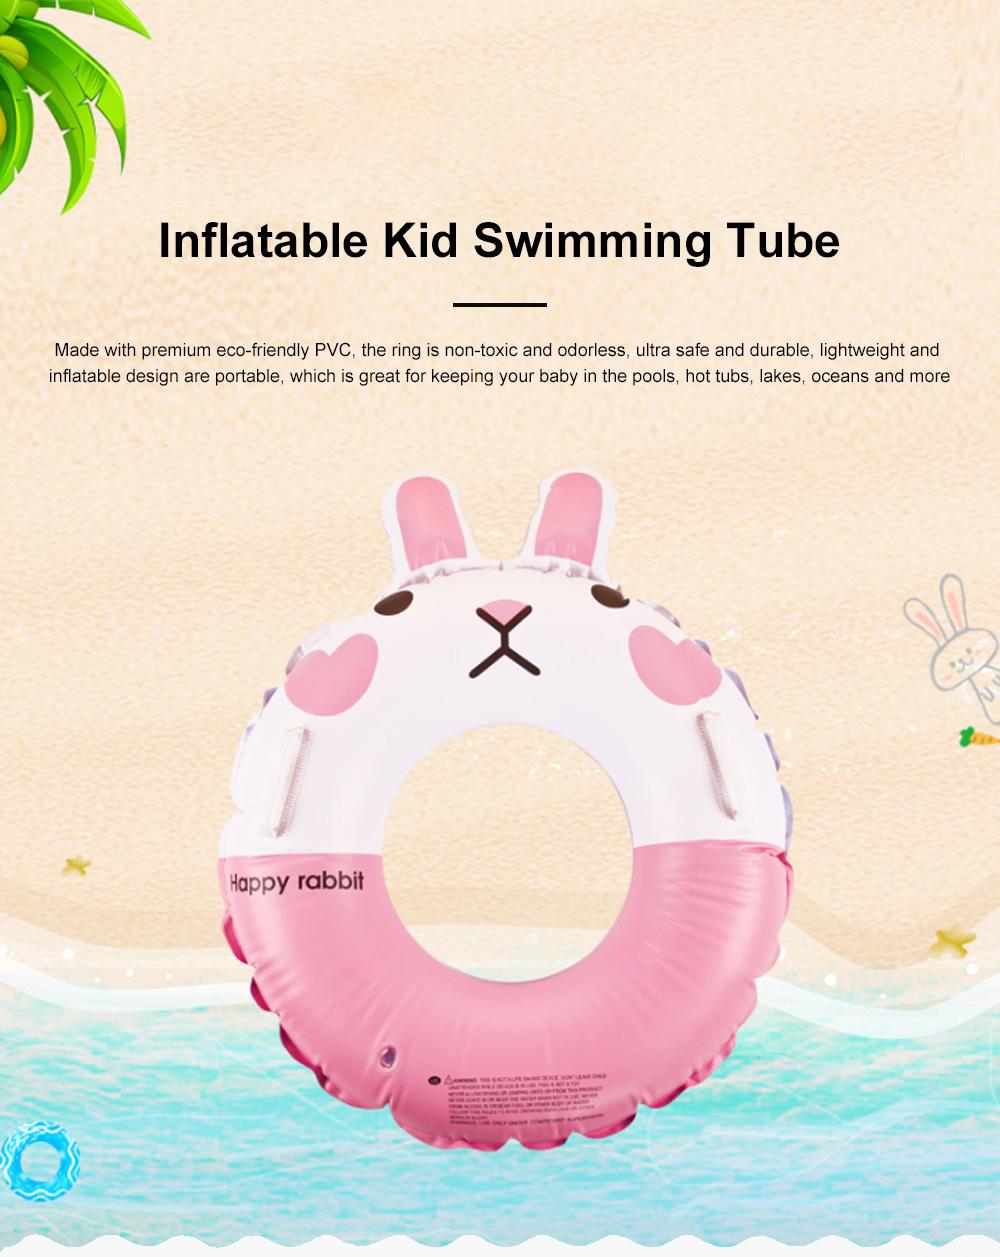 Kid Pool Inflatable Cartoon Rabbit Swimming Ring Anti-Leak Safe Children Swimming Tube 0